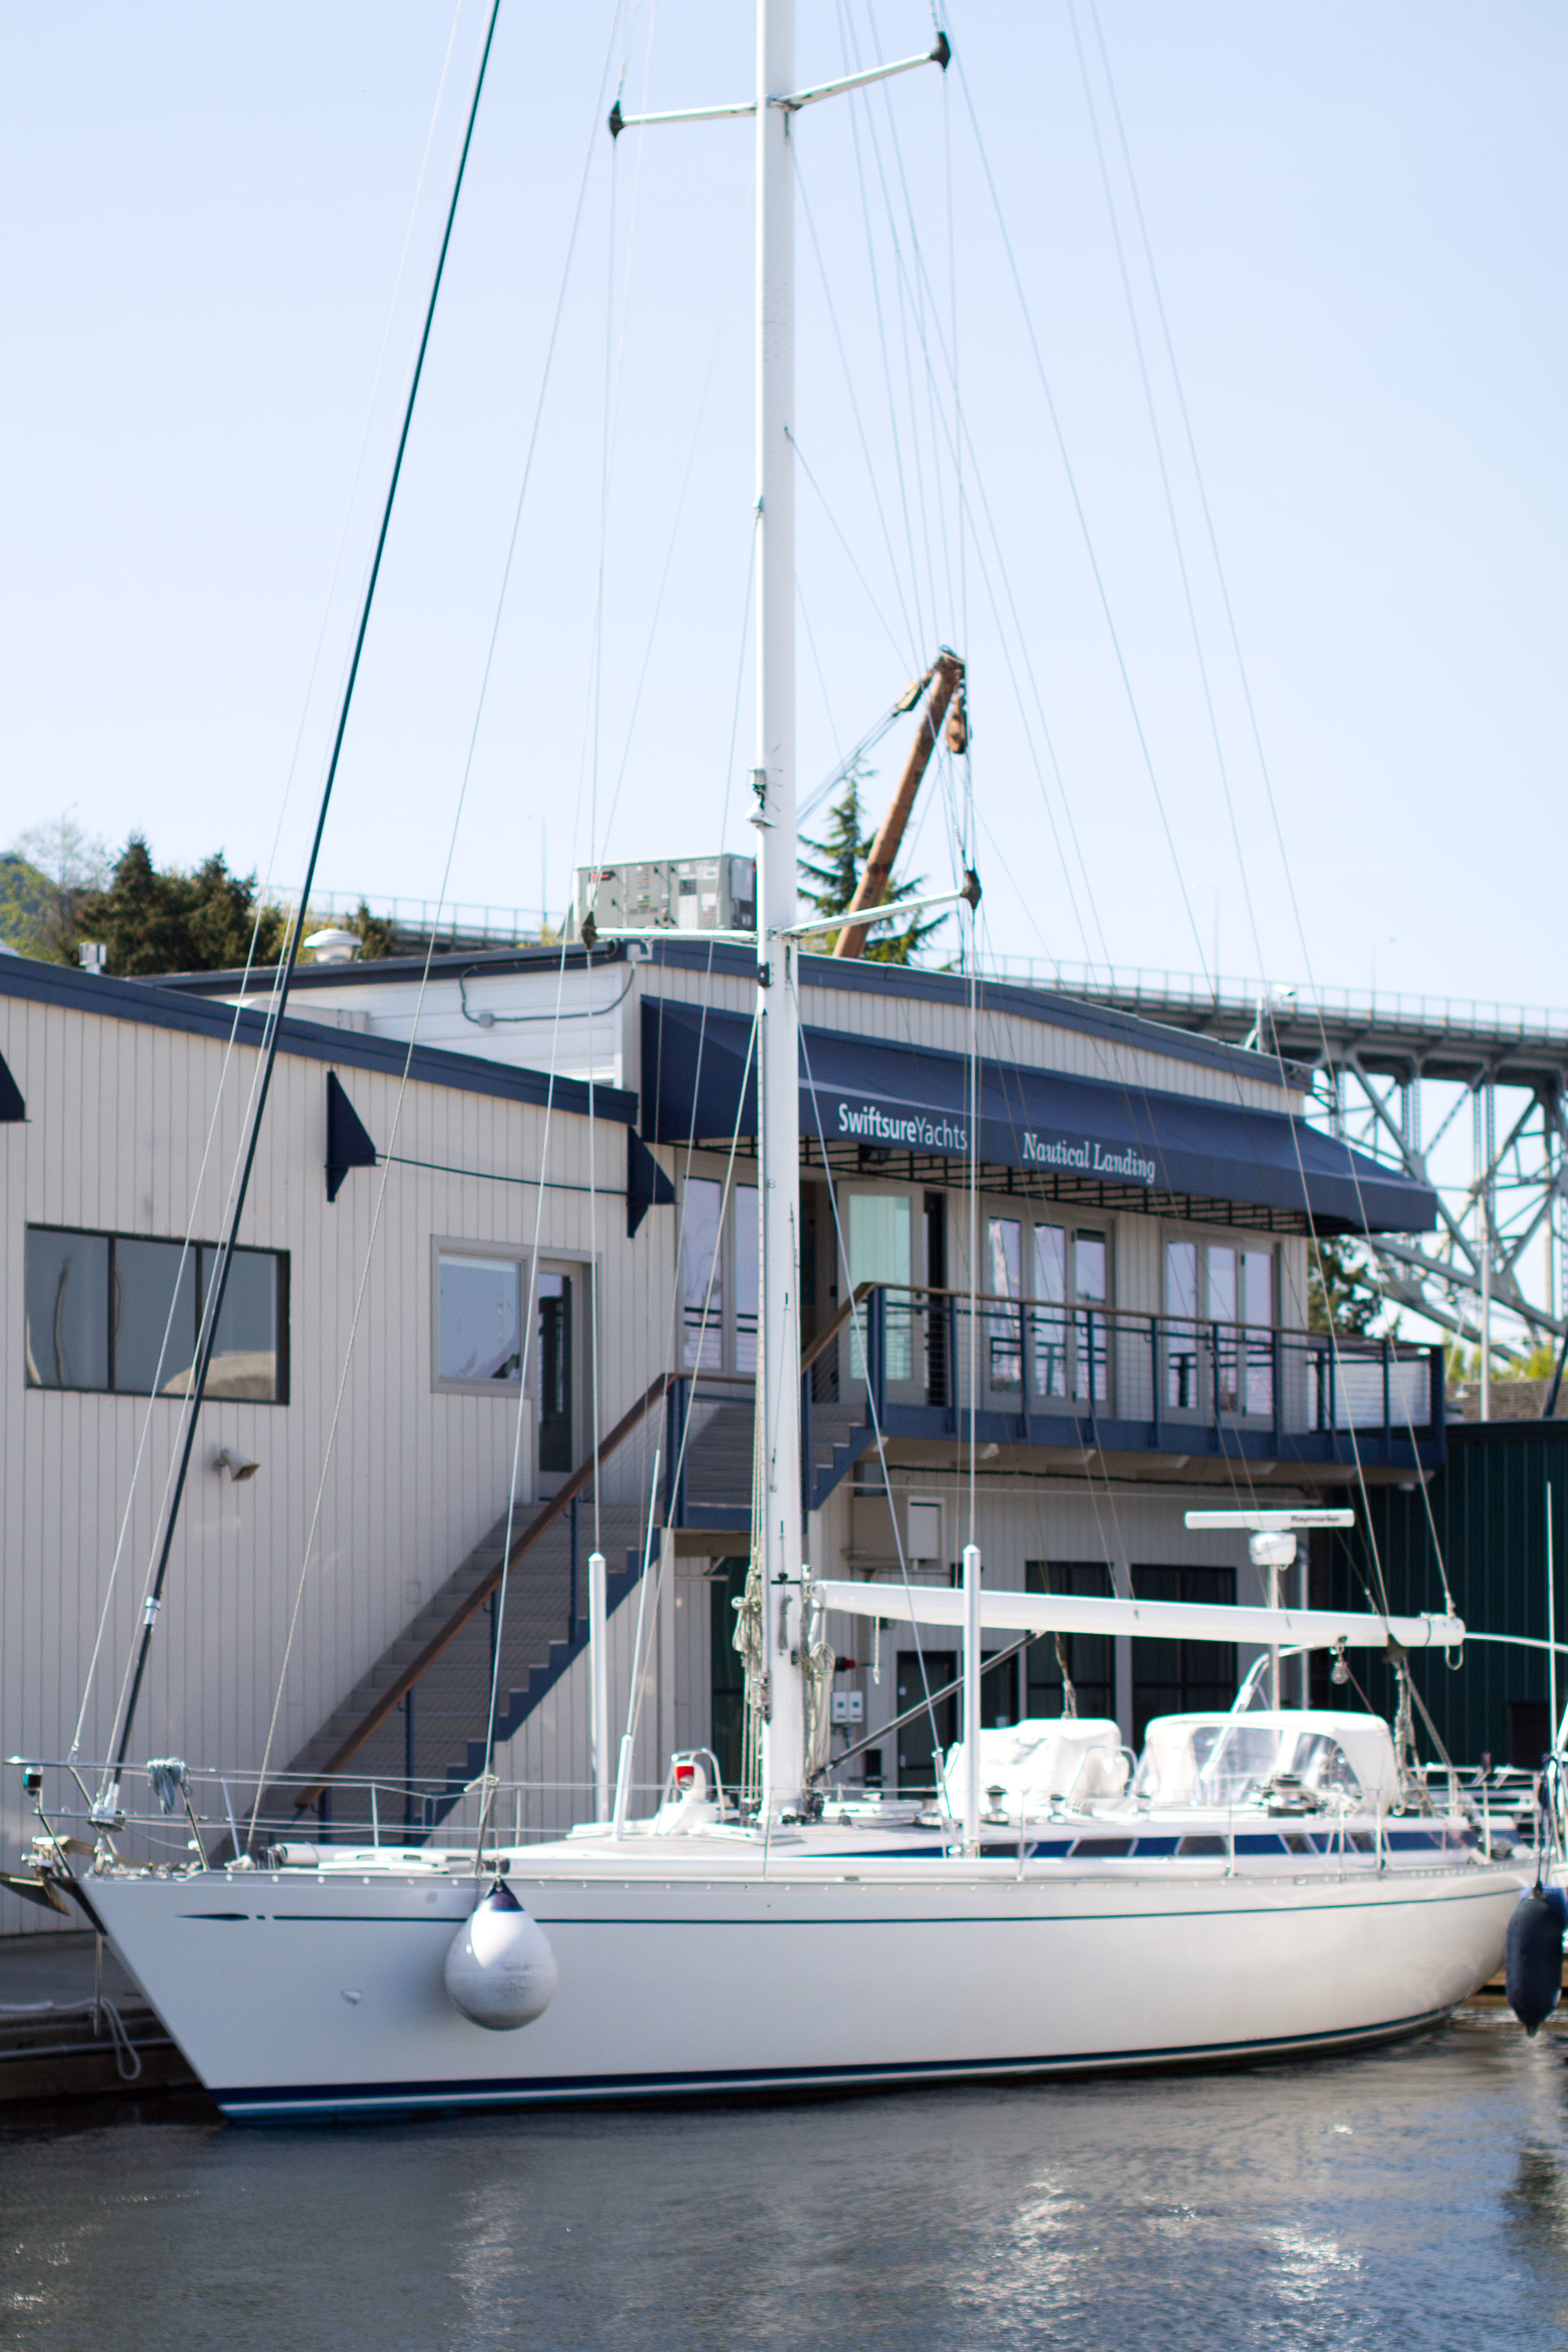 nautical landing building